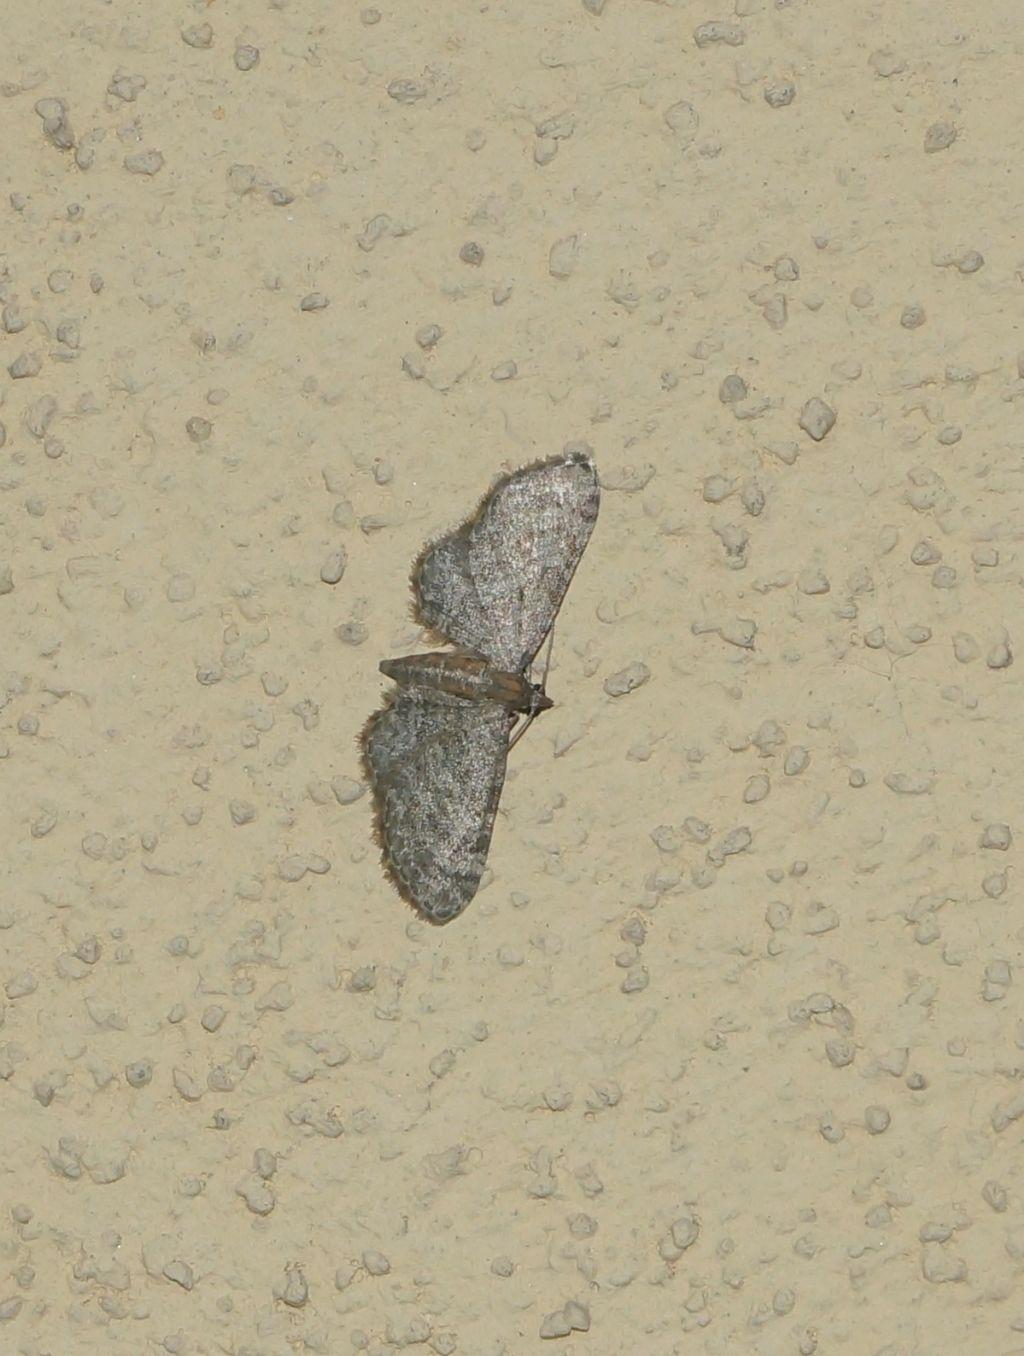 geometridae? Sì, Eupithecia cfr. haworthiata